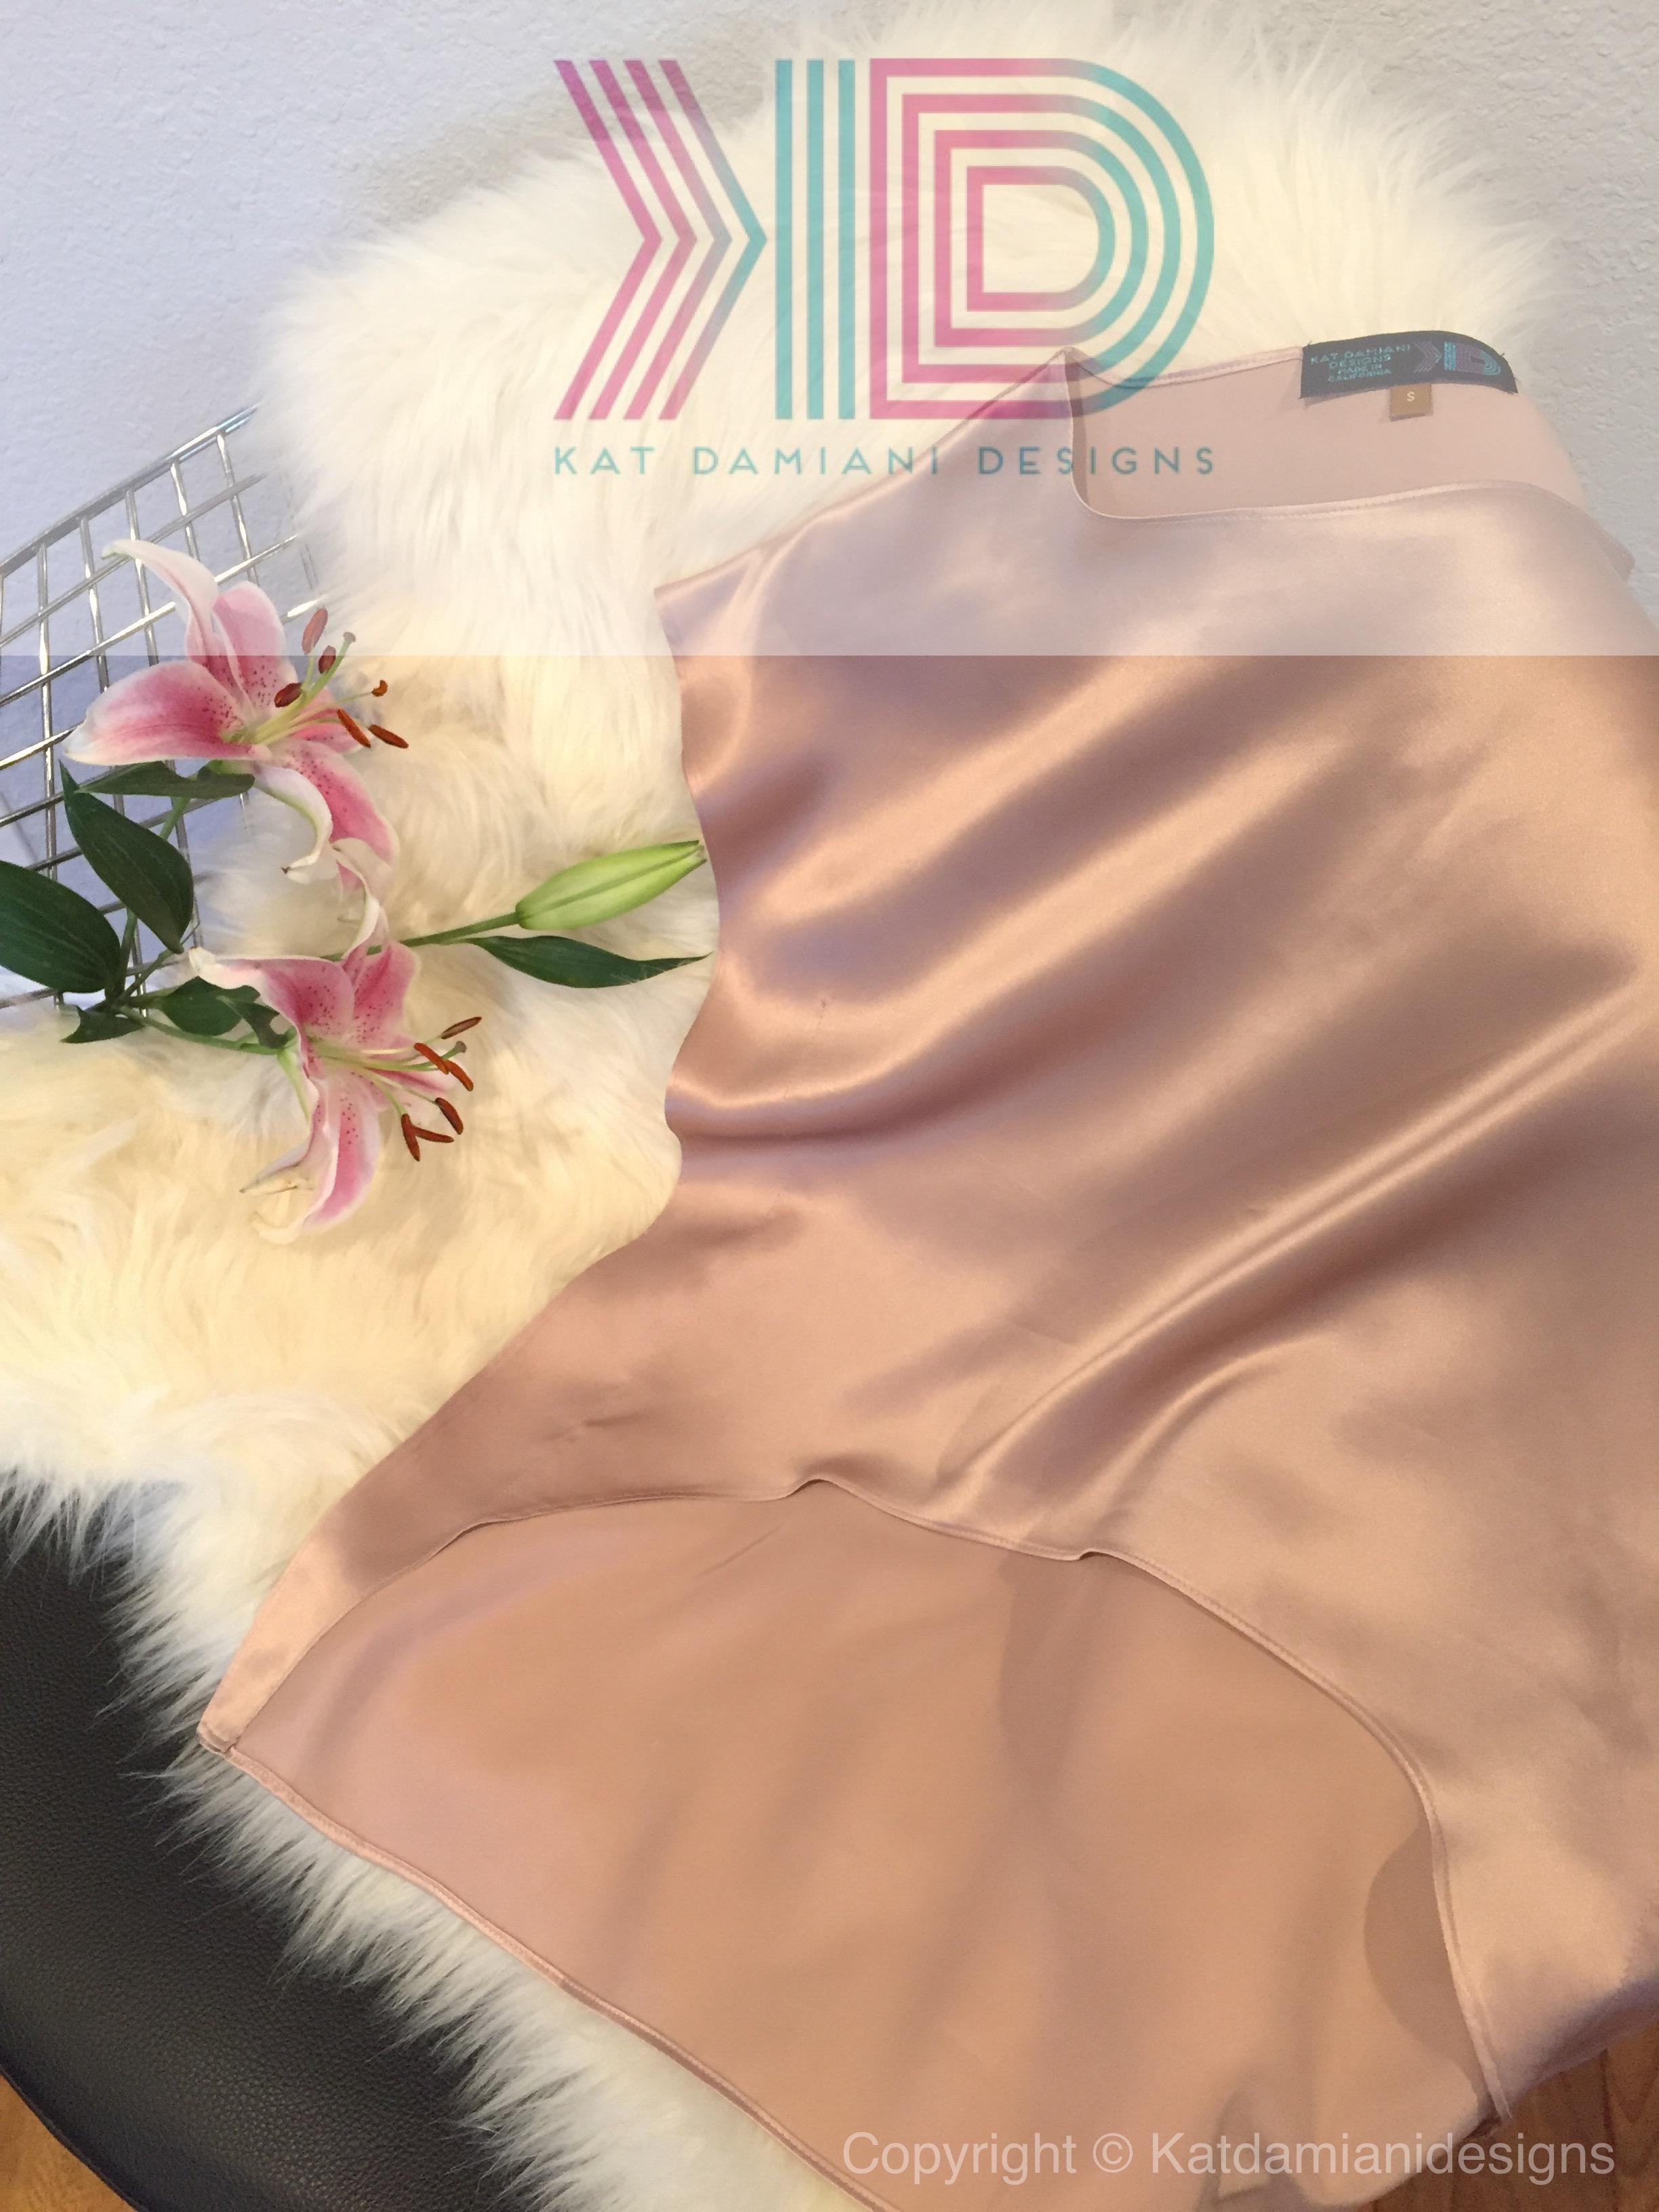 Kat Damiani Designs Silk Blouse